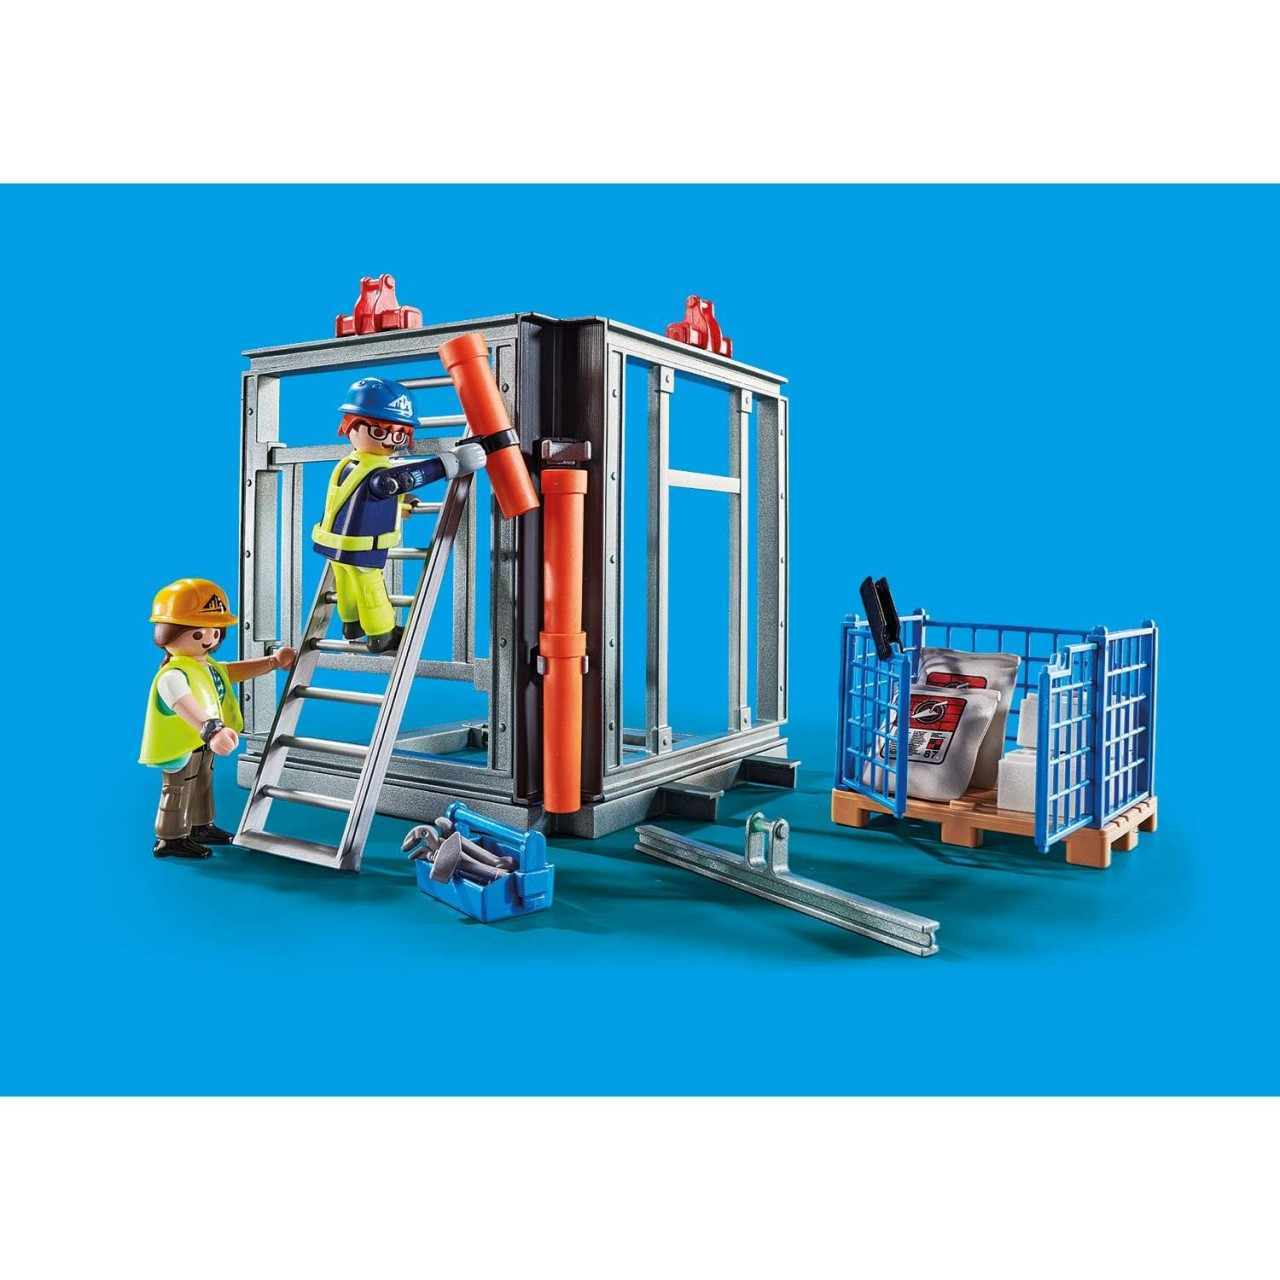 Playmobil 70441 RC-Baukran mit Bauteil